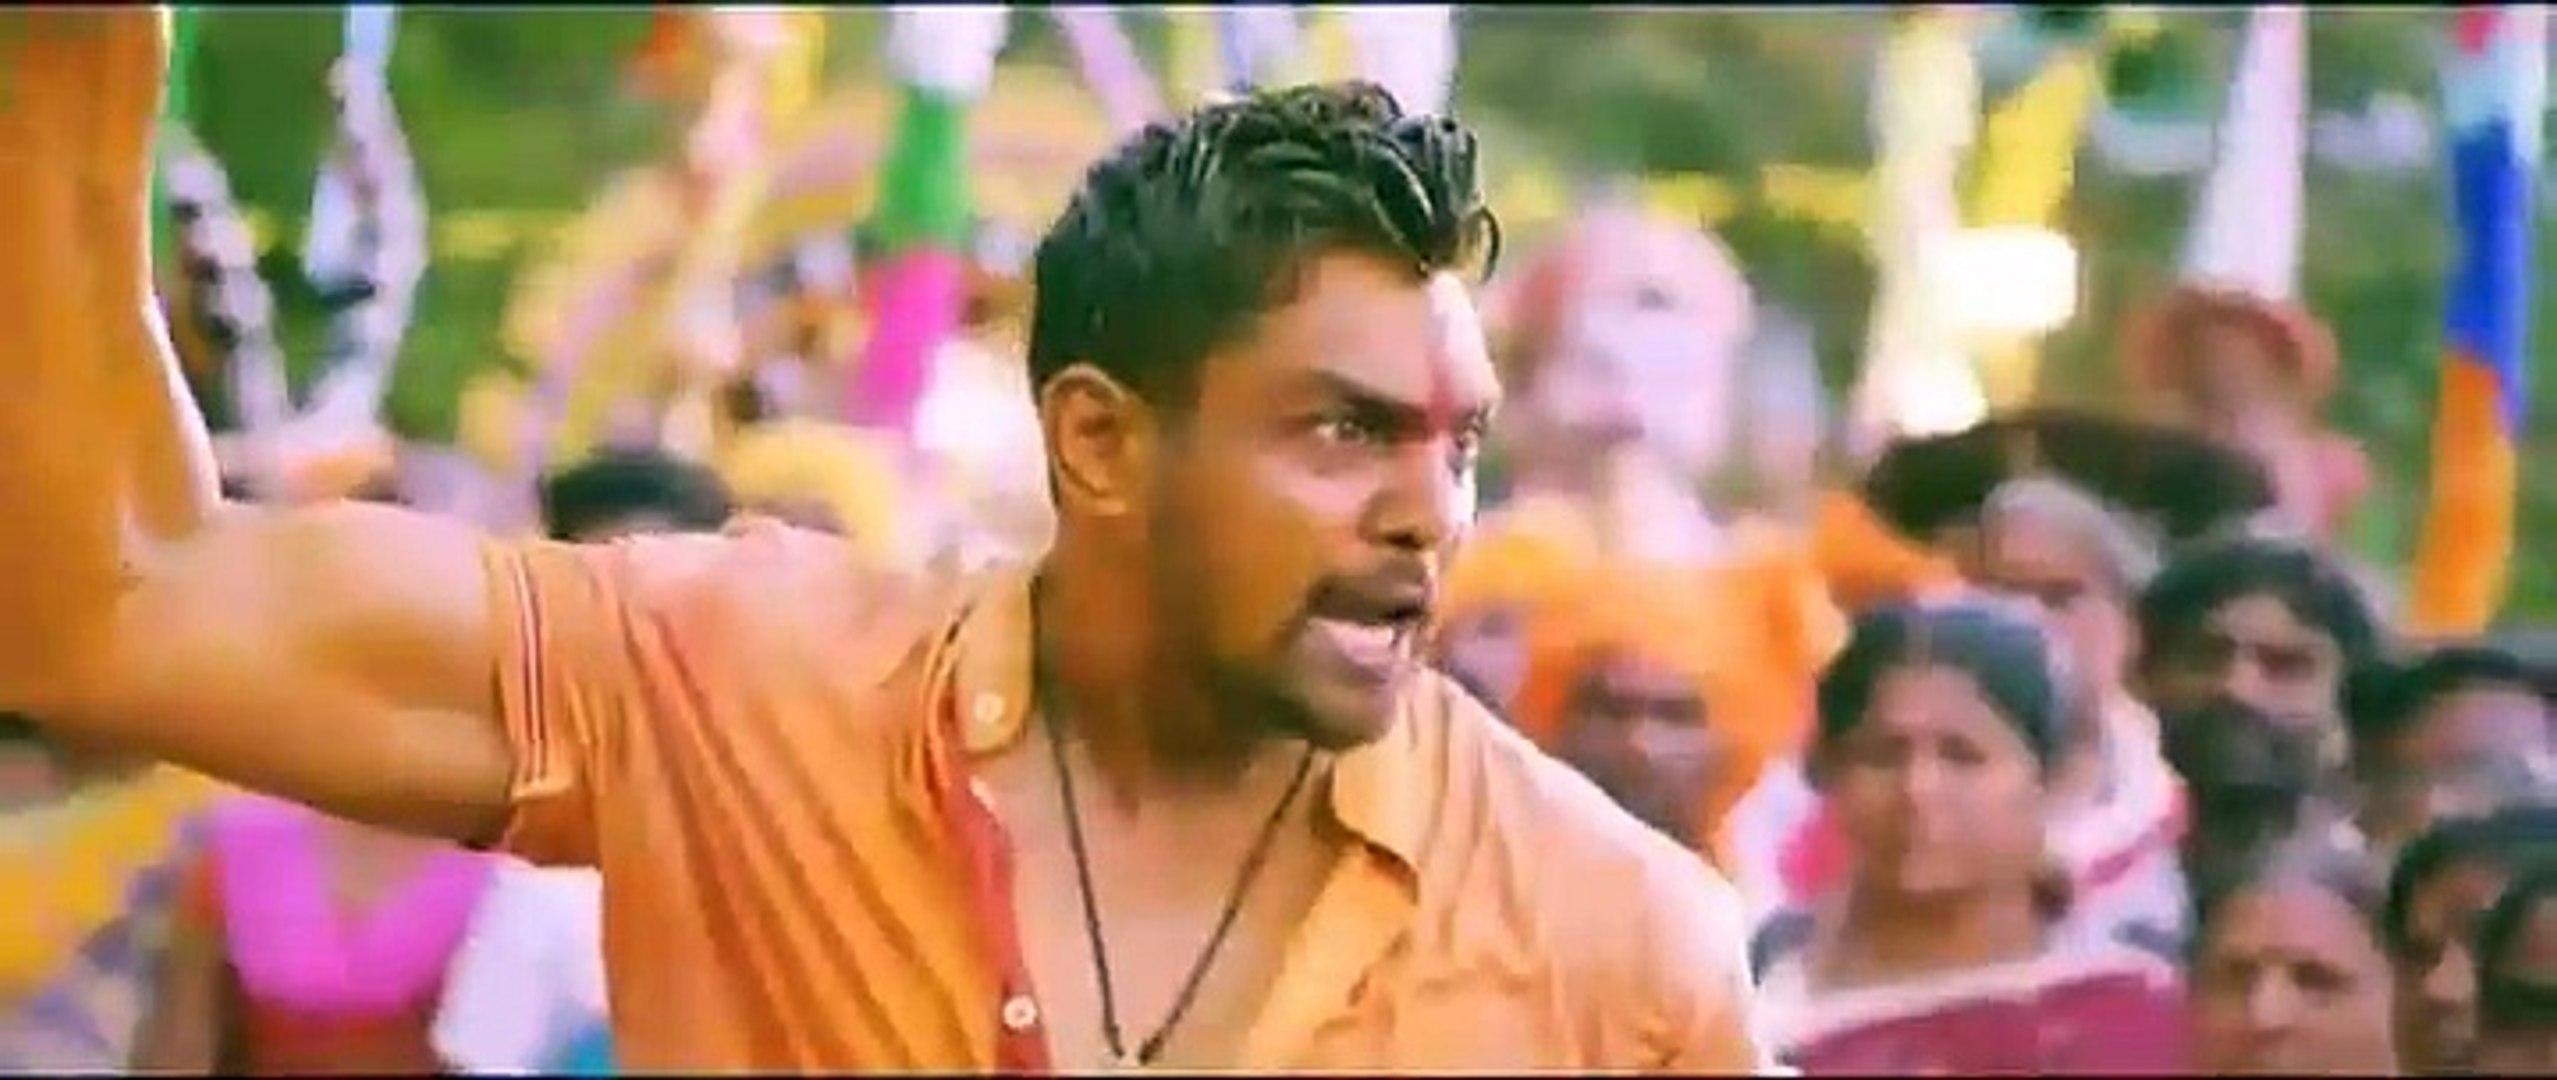 South indian hindi movie 2018  'bharjari '  part - 3.  full movie, Bharjari hindi dubbed m